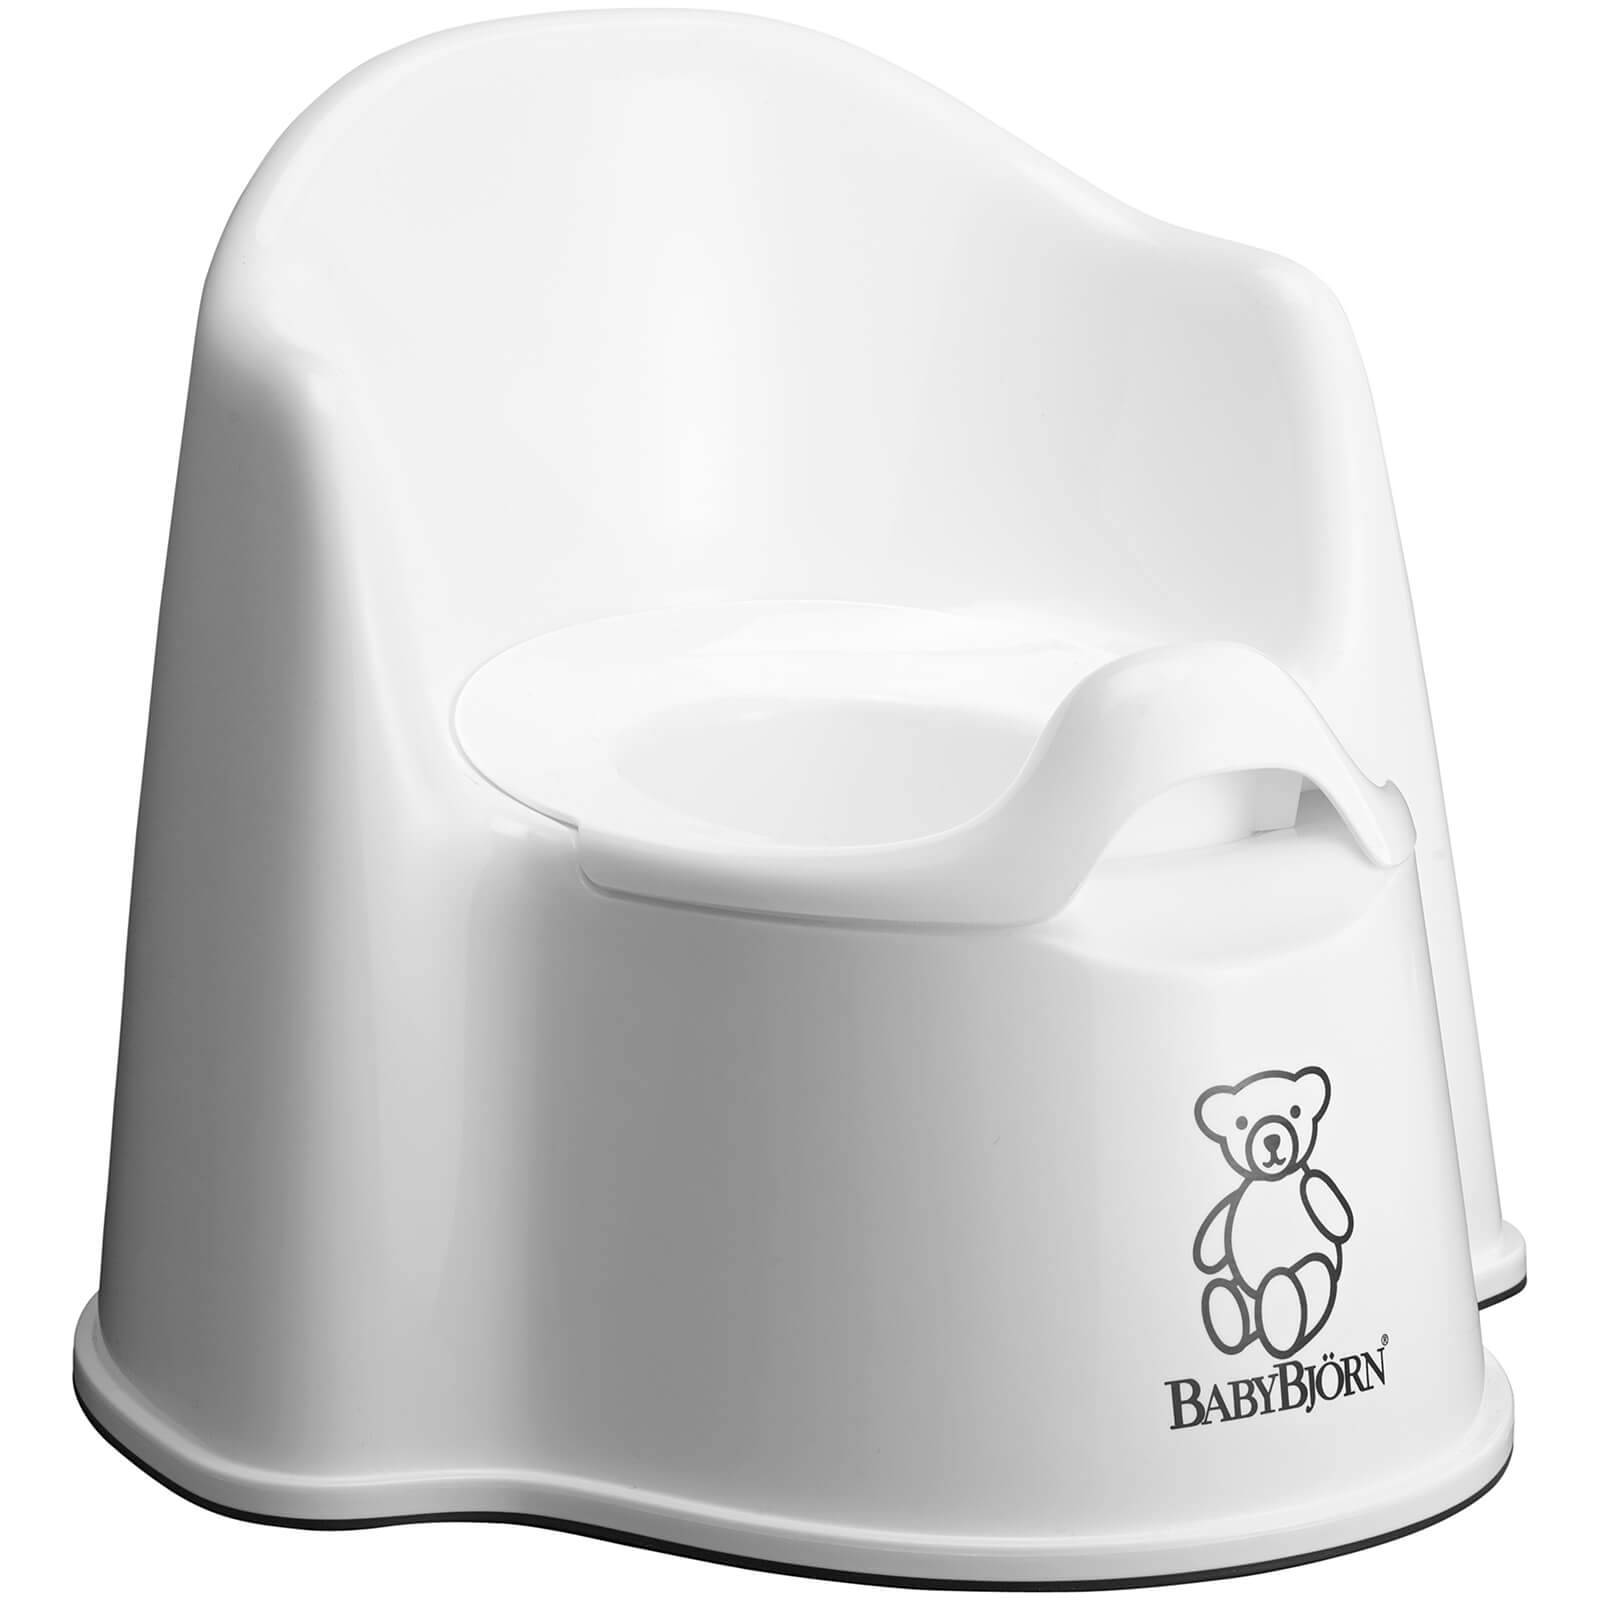 BABYBJÖRN Potty Chair - White